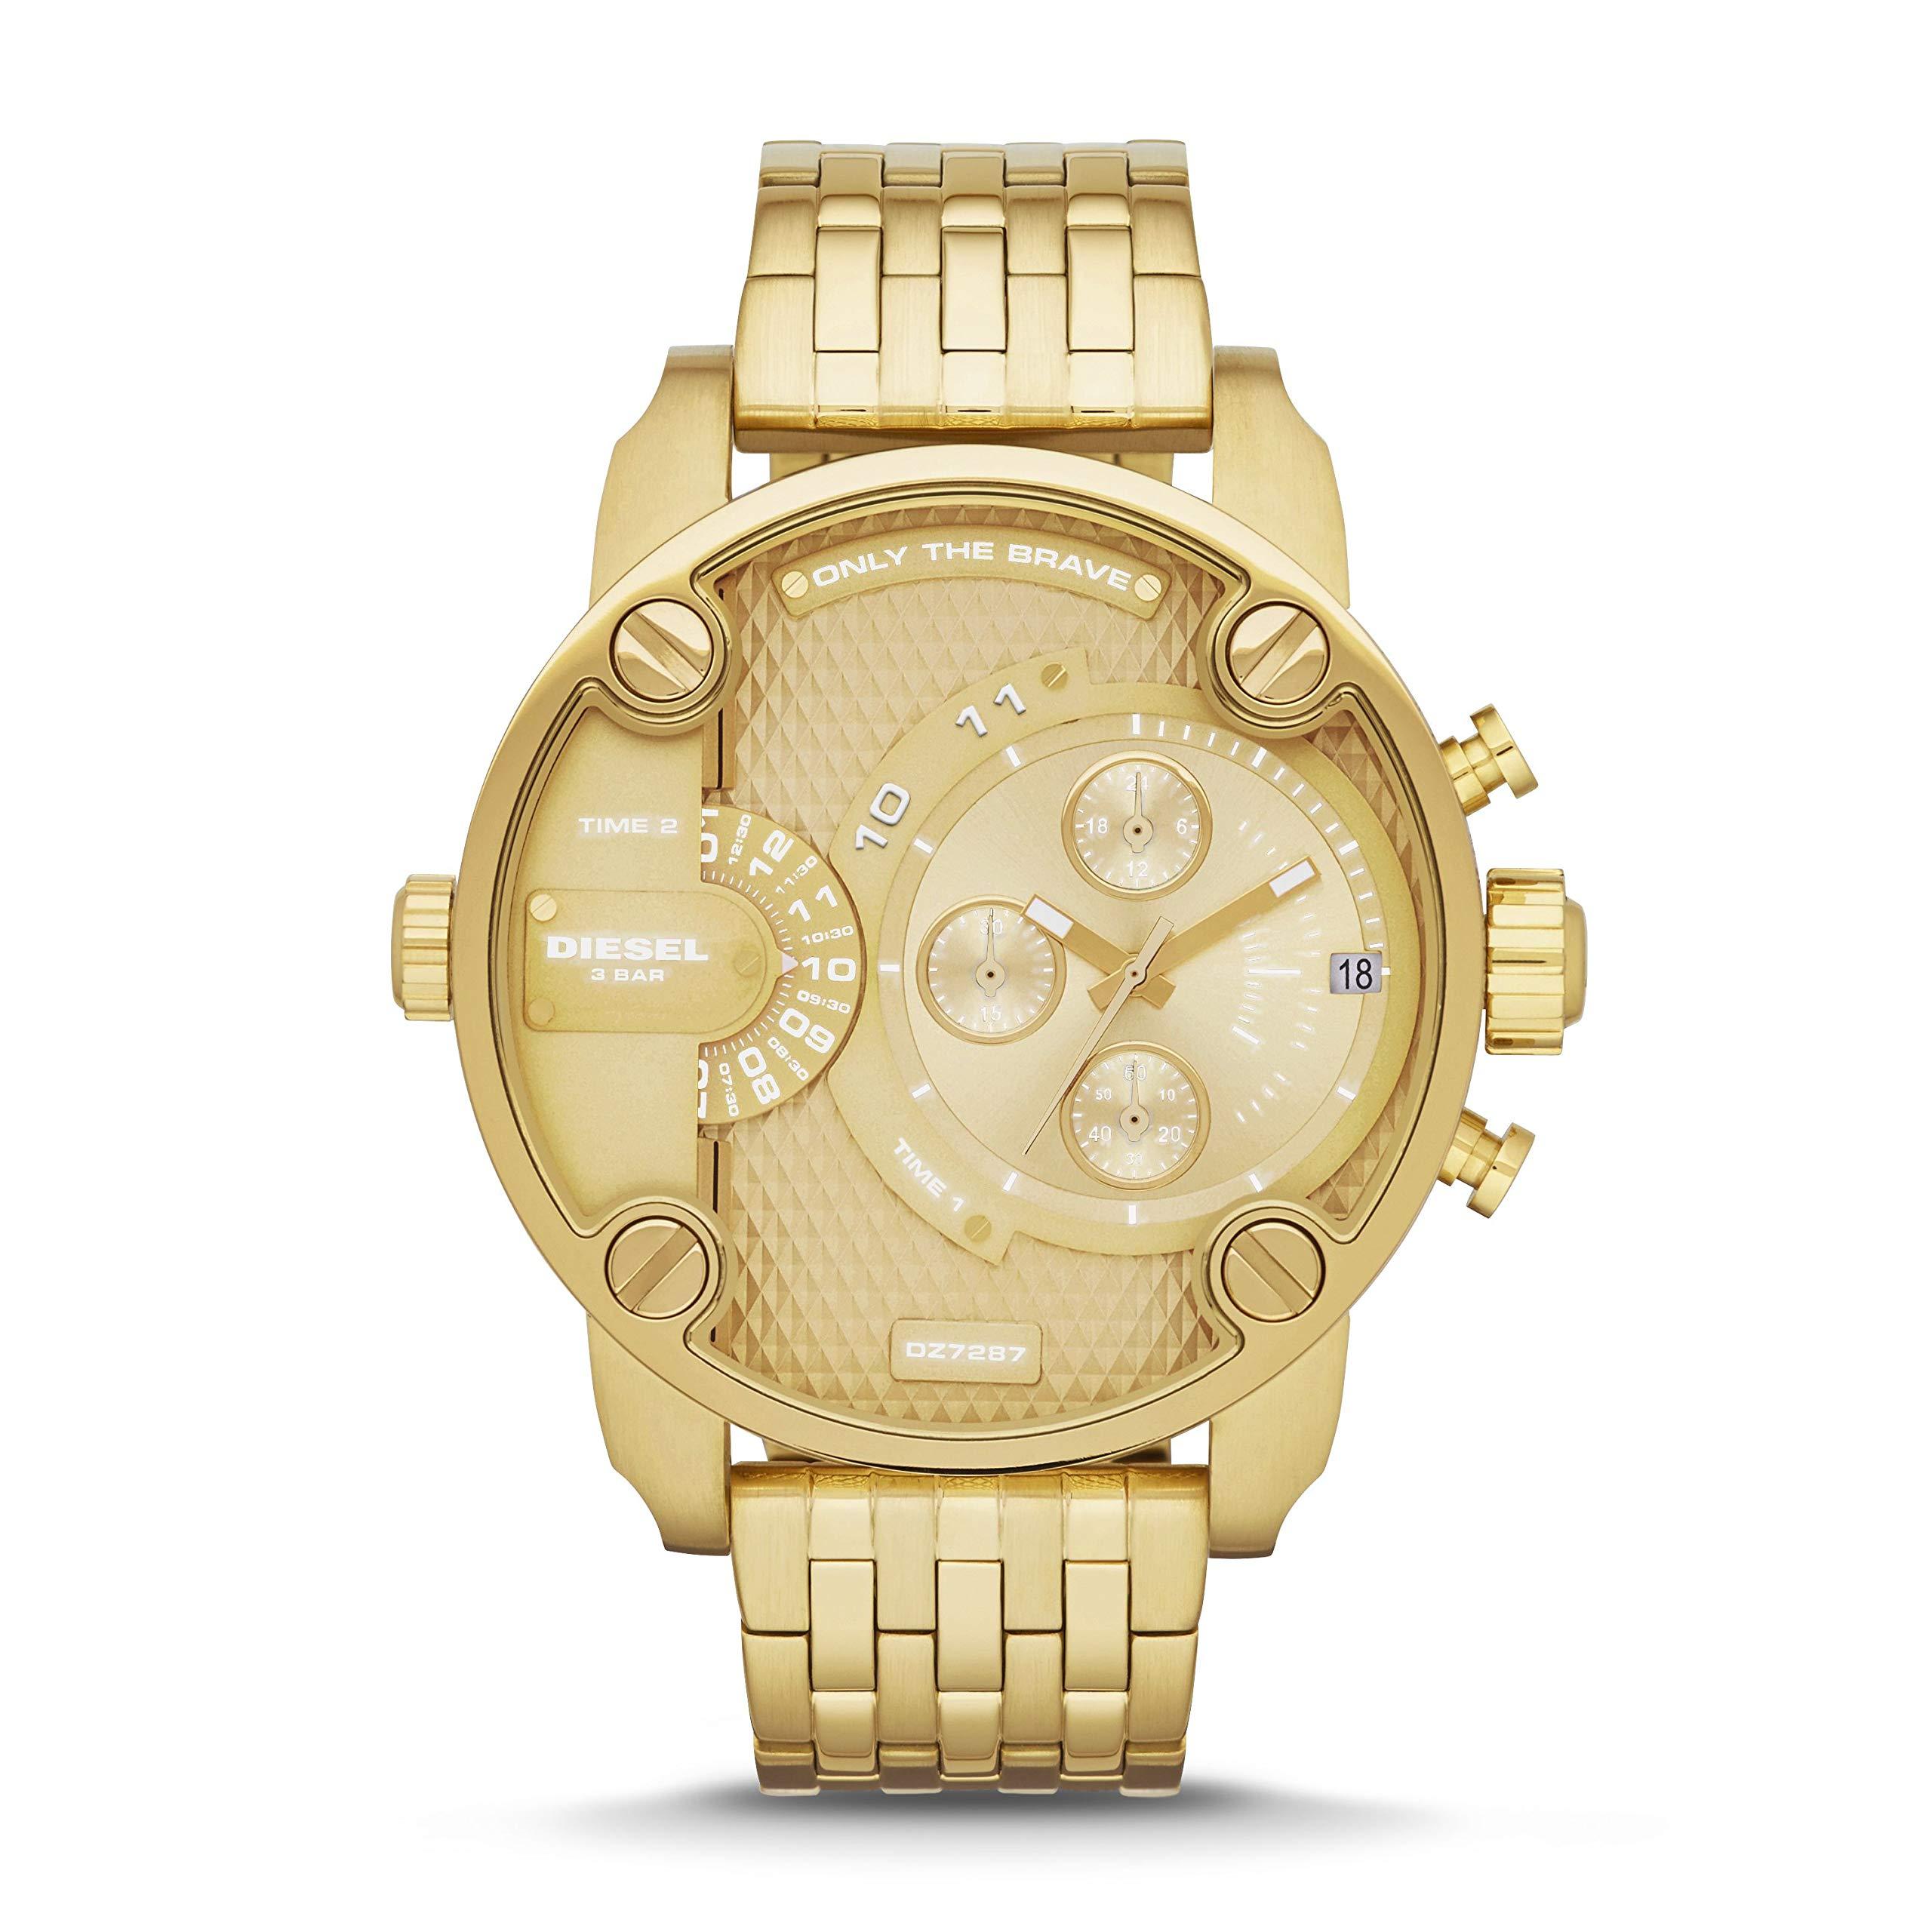 Diesel Men's Little Daddy Quartz Stainless Steel Chronograph Watch, Color: Gold-Tone (Model: DZ7287) by Diesel